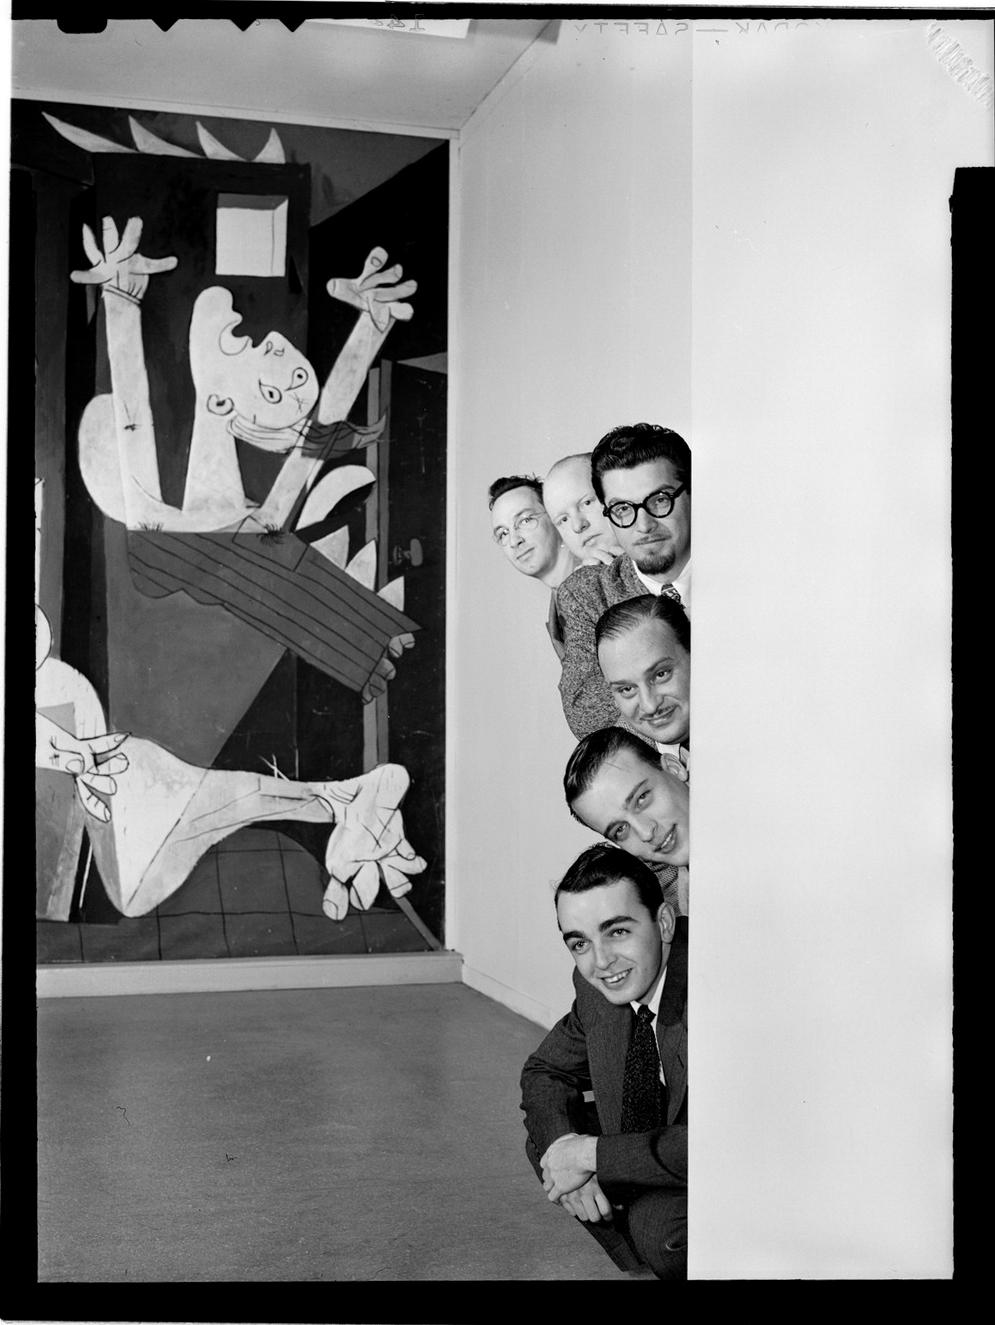 Portrait of Ralph Burns, Edwin A. Finckel, George Handy, Neal Hefti, Johnny Richards, and Eddie Sauter, Museum of Modern Art, New York, N.Y., ca. Mar. 1947